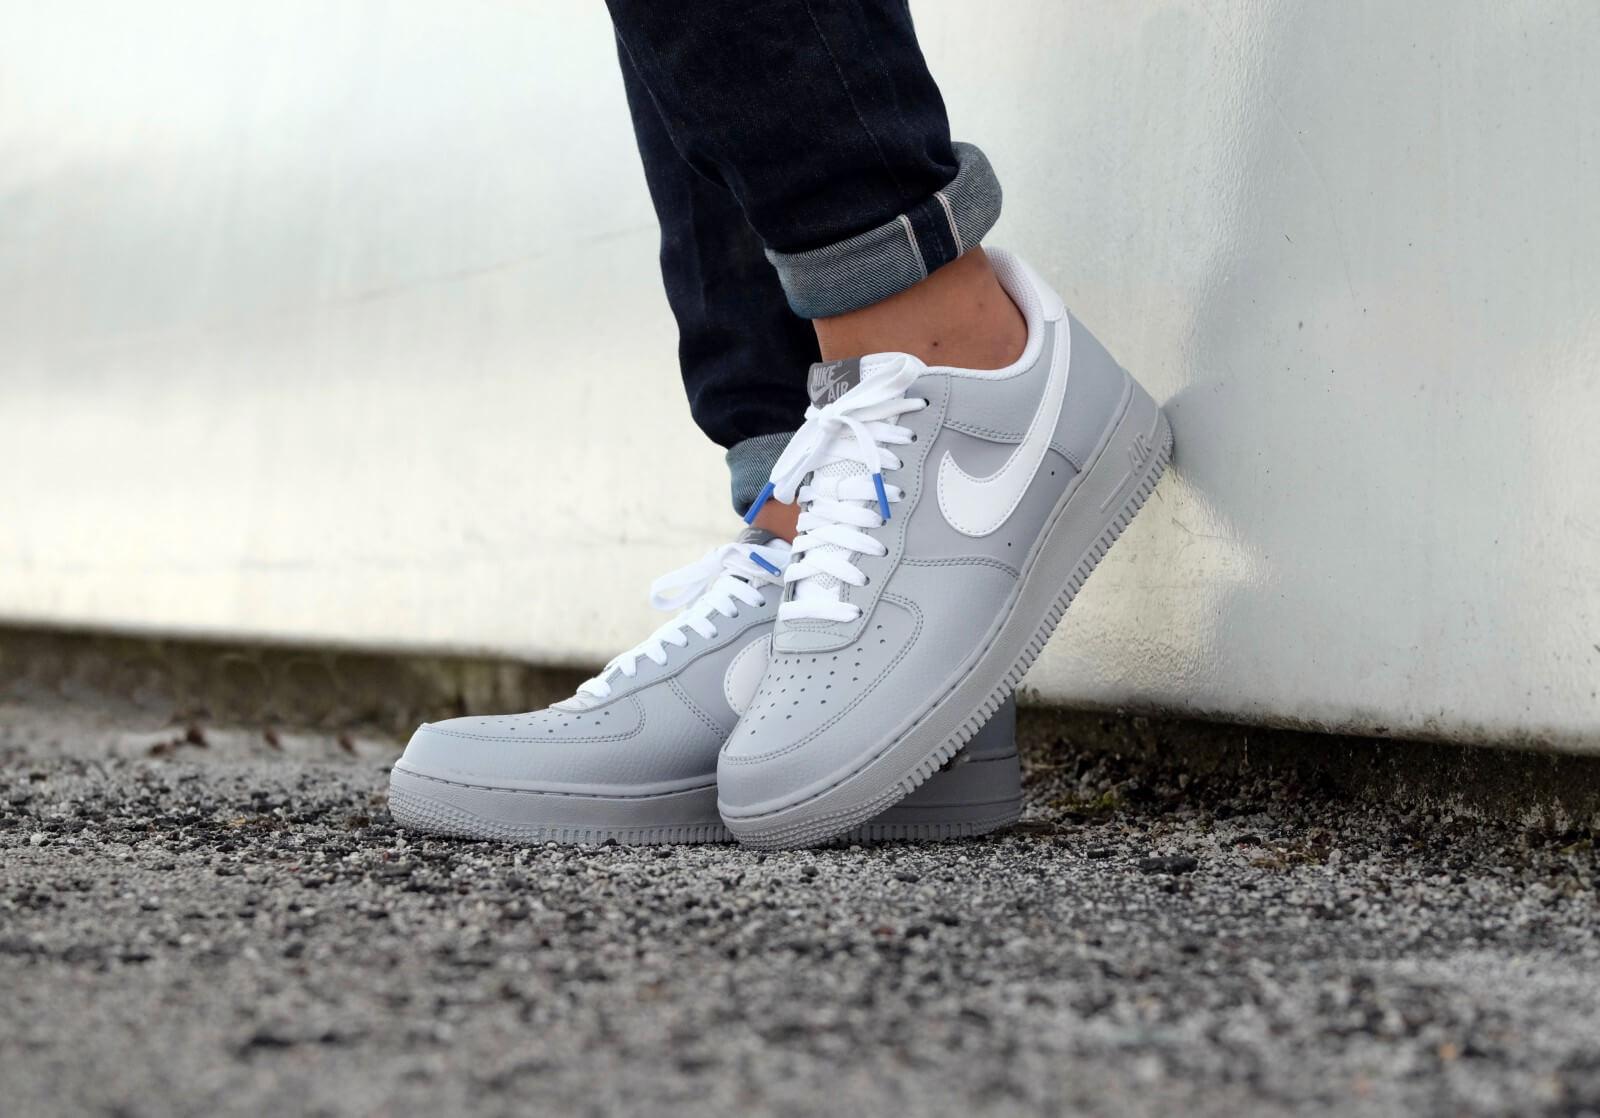 nike air force 1 wolf grey/white